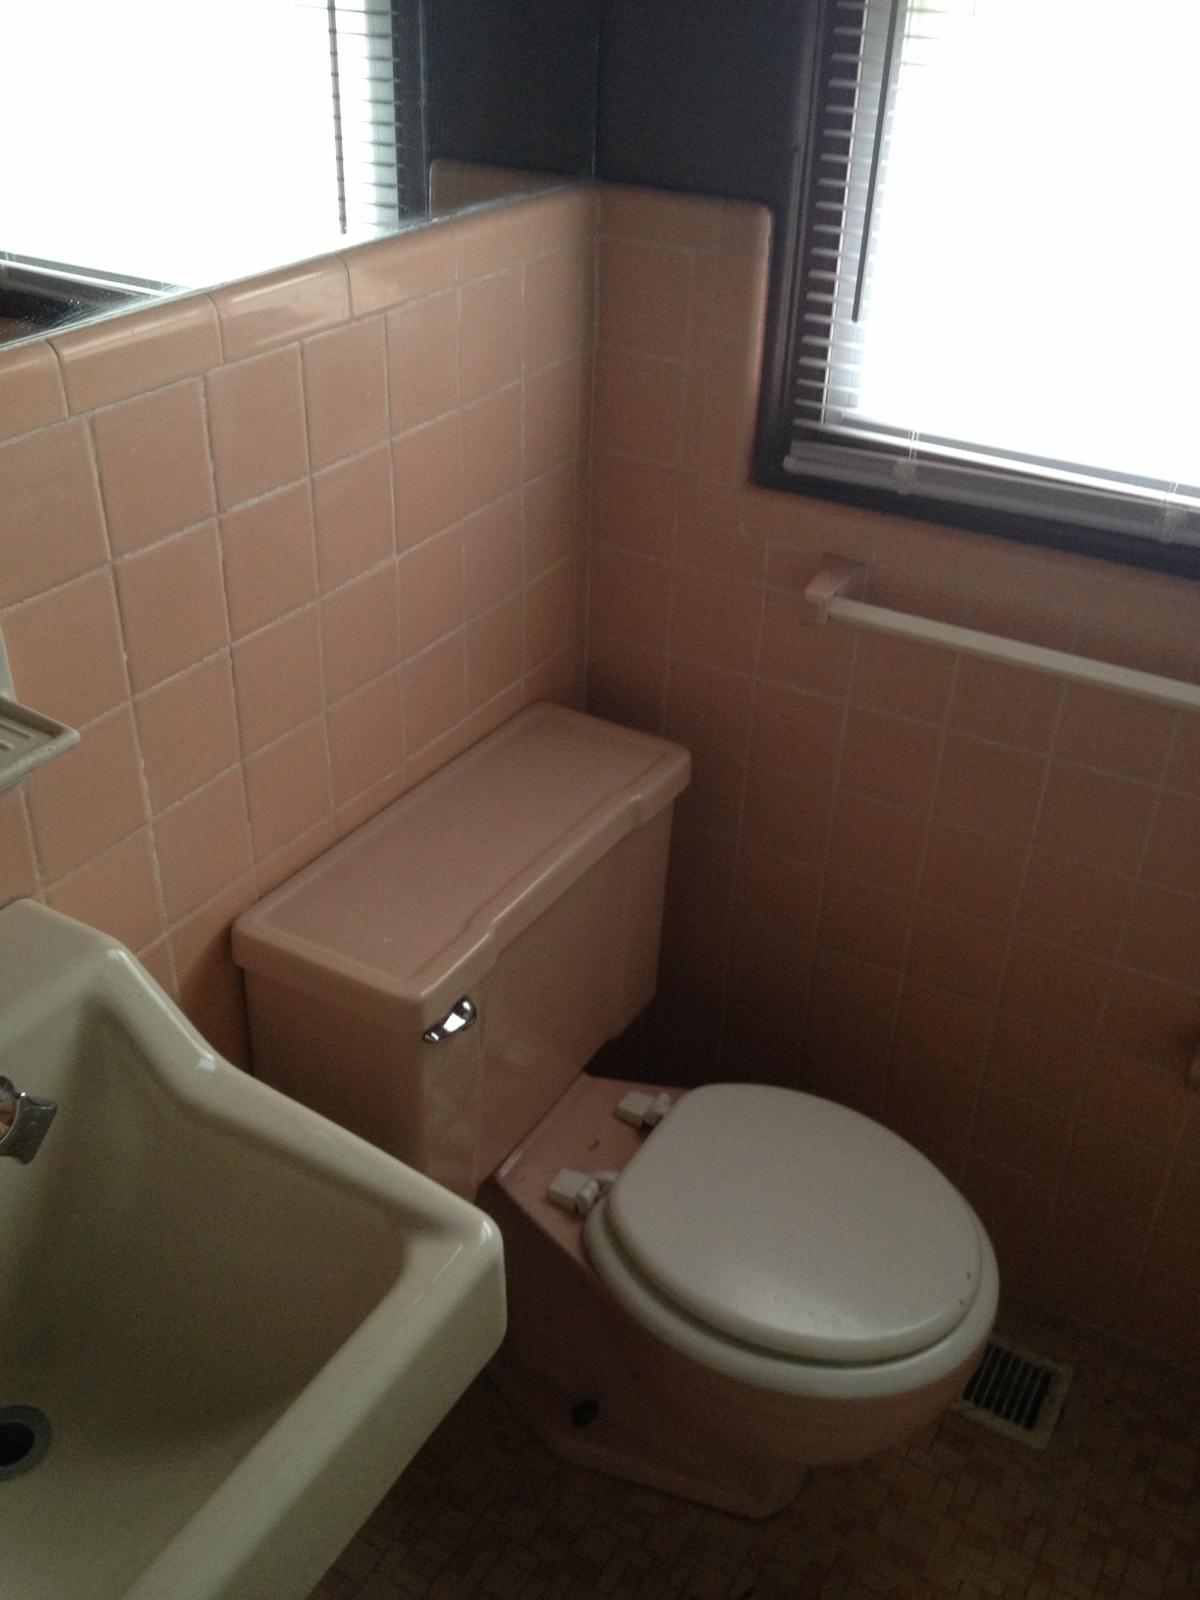 Moving Walls Pt. 3: Bathroom andLaundry